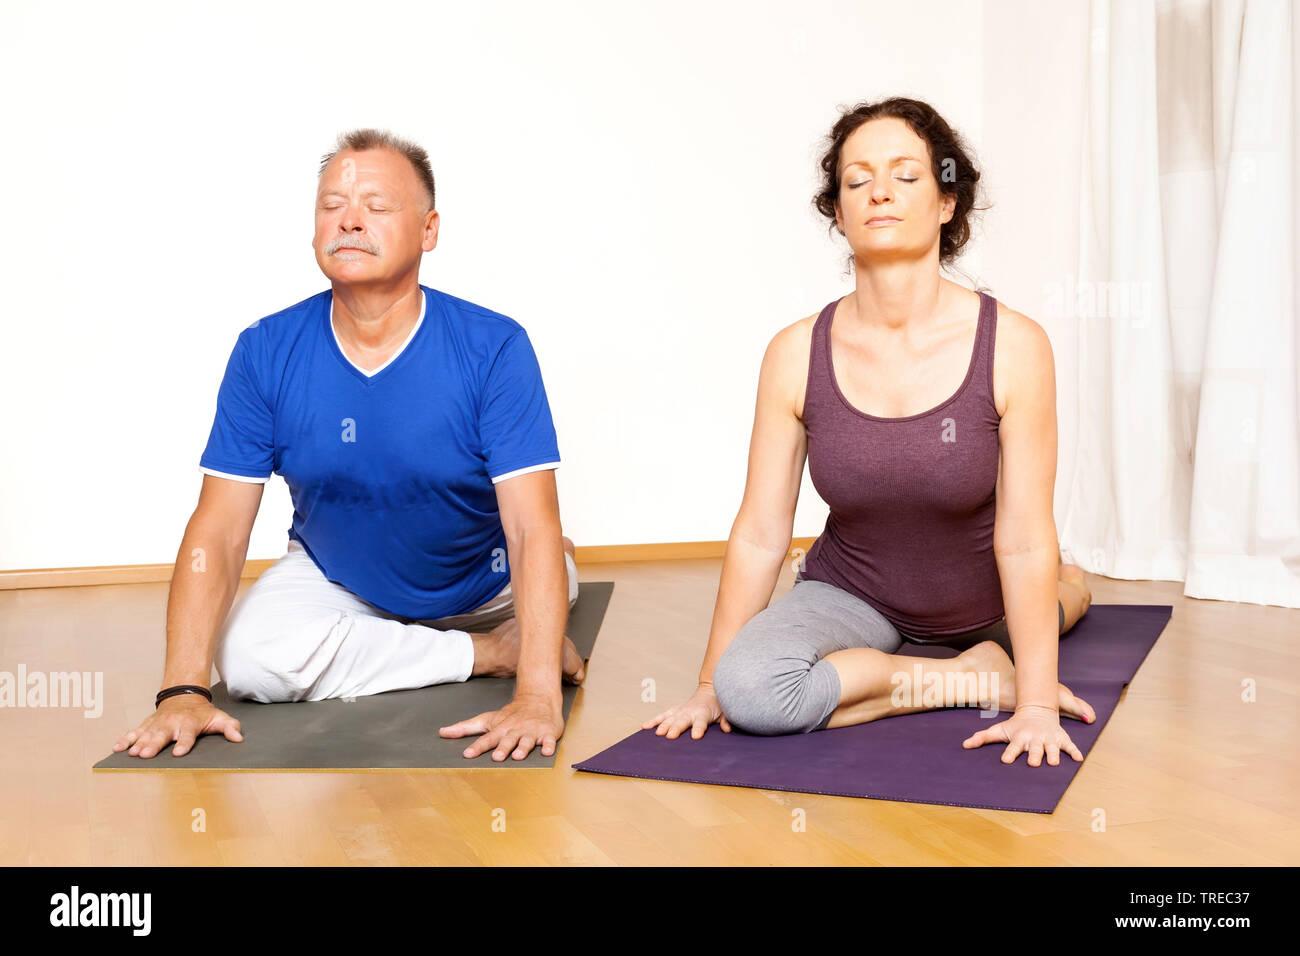 Frau und Mann machen Yoga-Uebungen, Europa | woman and man doing yoga, Europe | BLWS522590.jpg [ (c) blickwinkel/McPHOTO/M. Gann Tel. +49 (0)2302-2793 - Stock Image